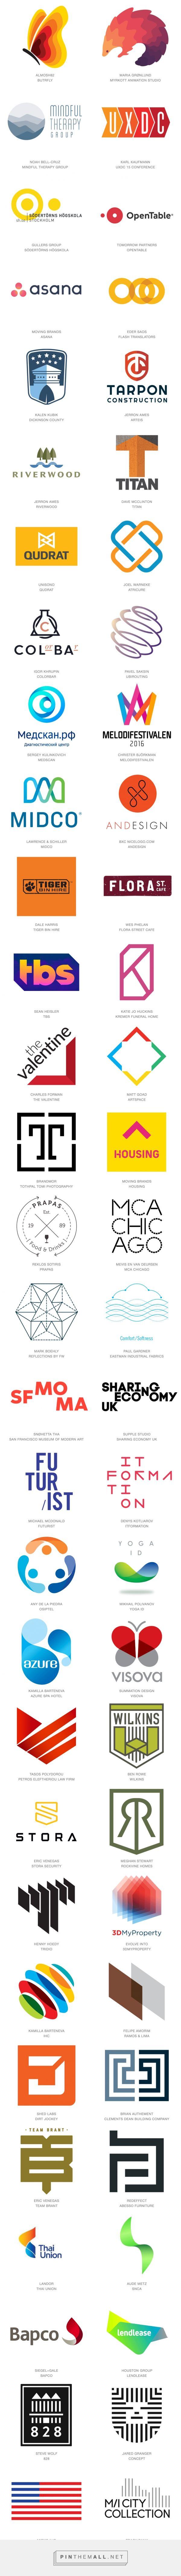 2016 Logo Trends | LogoLounge